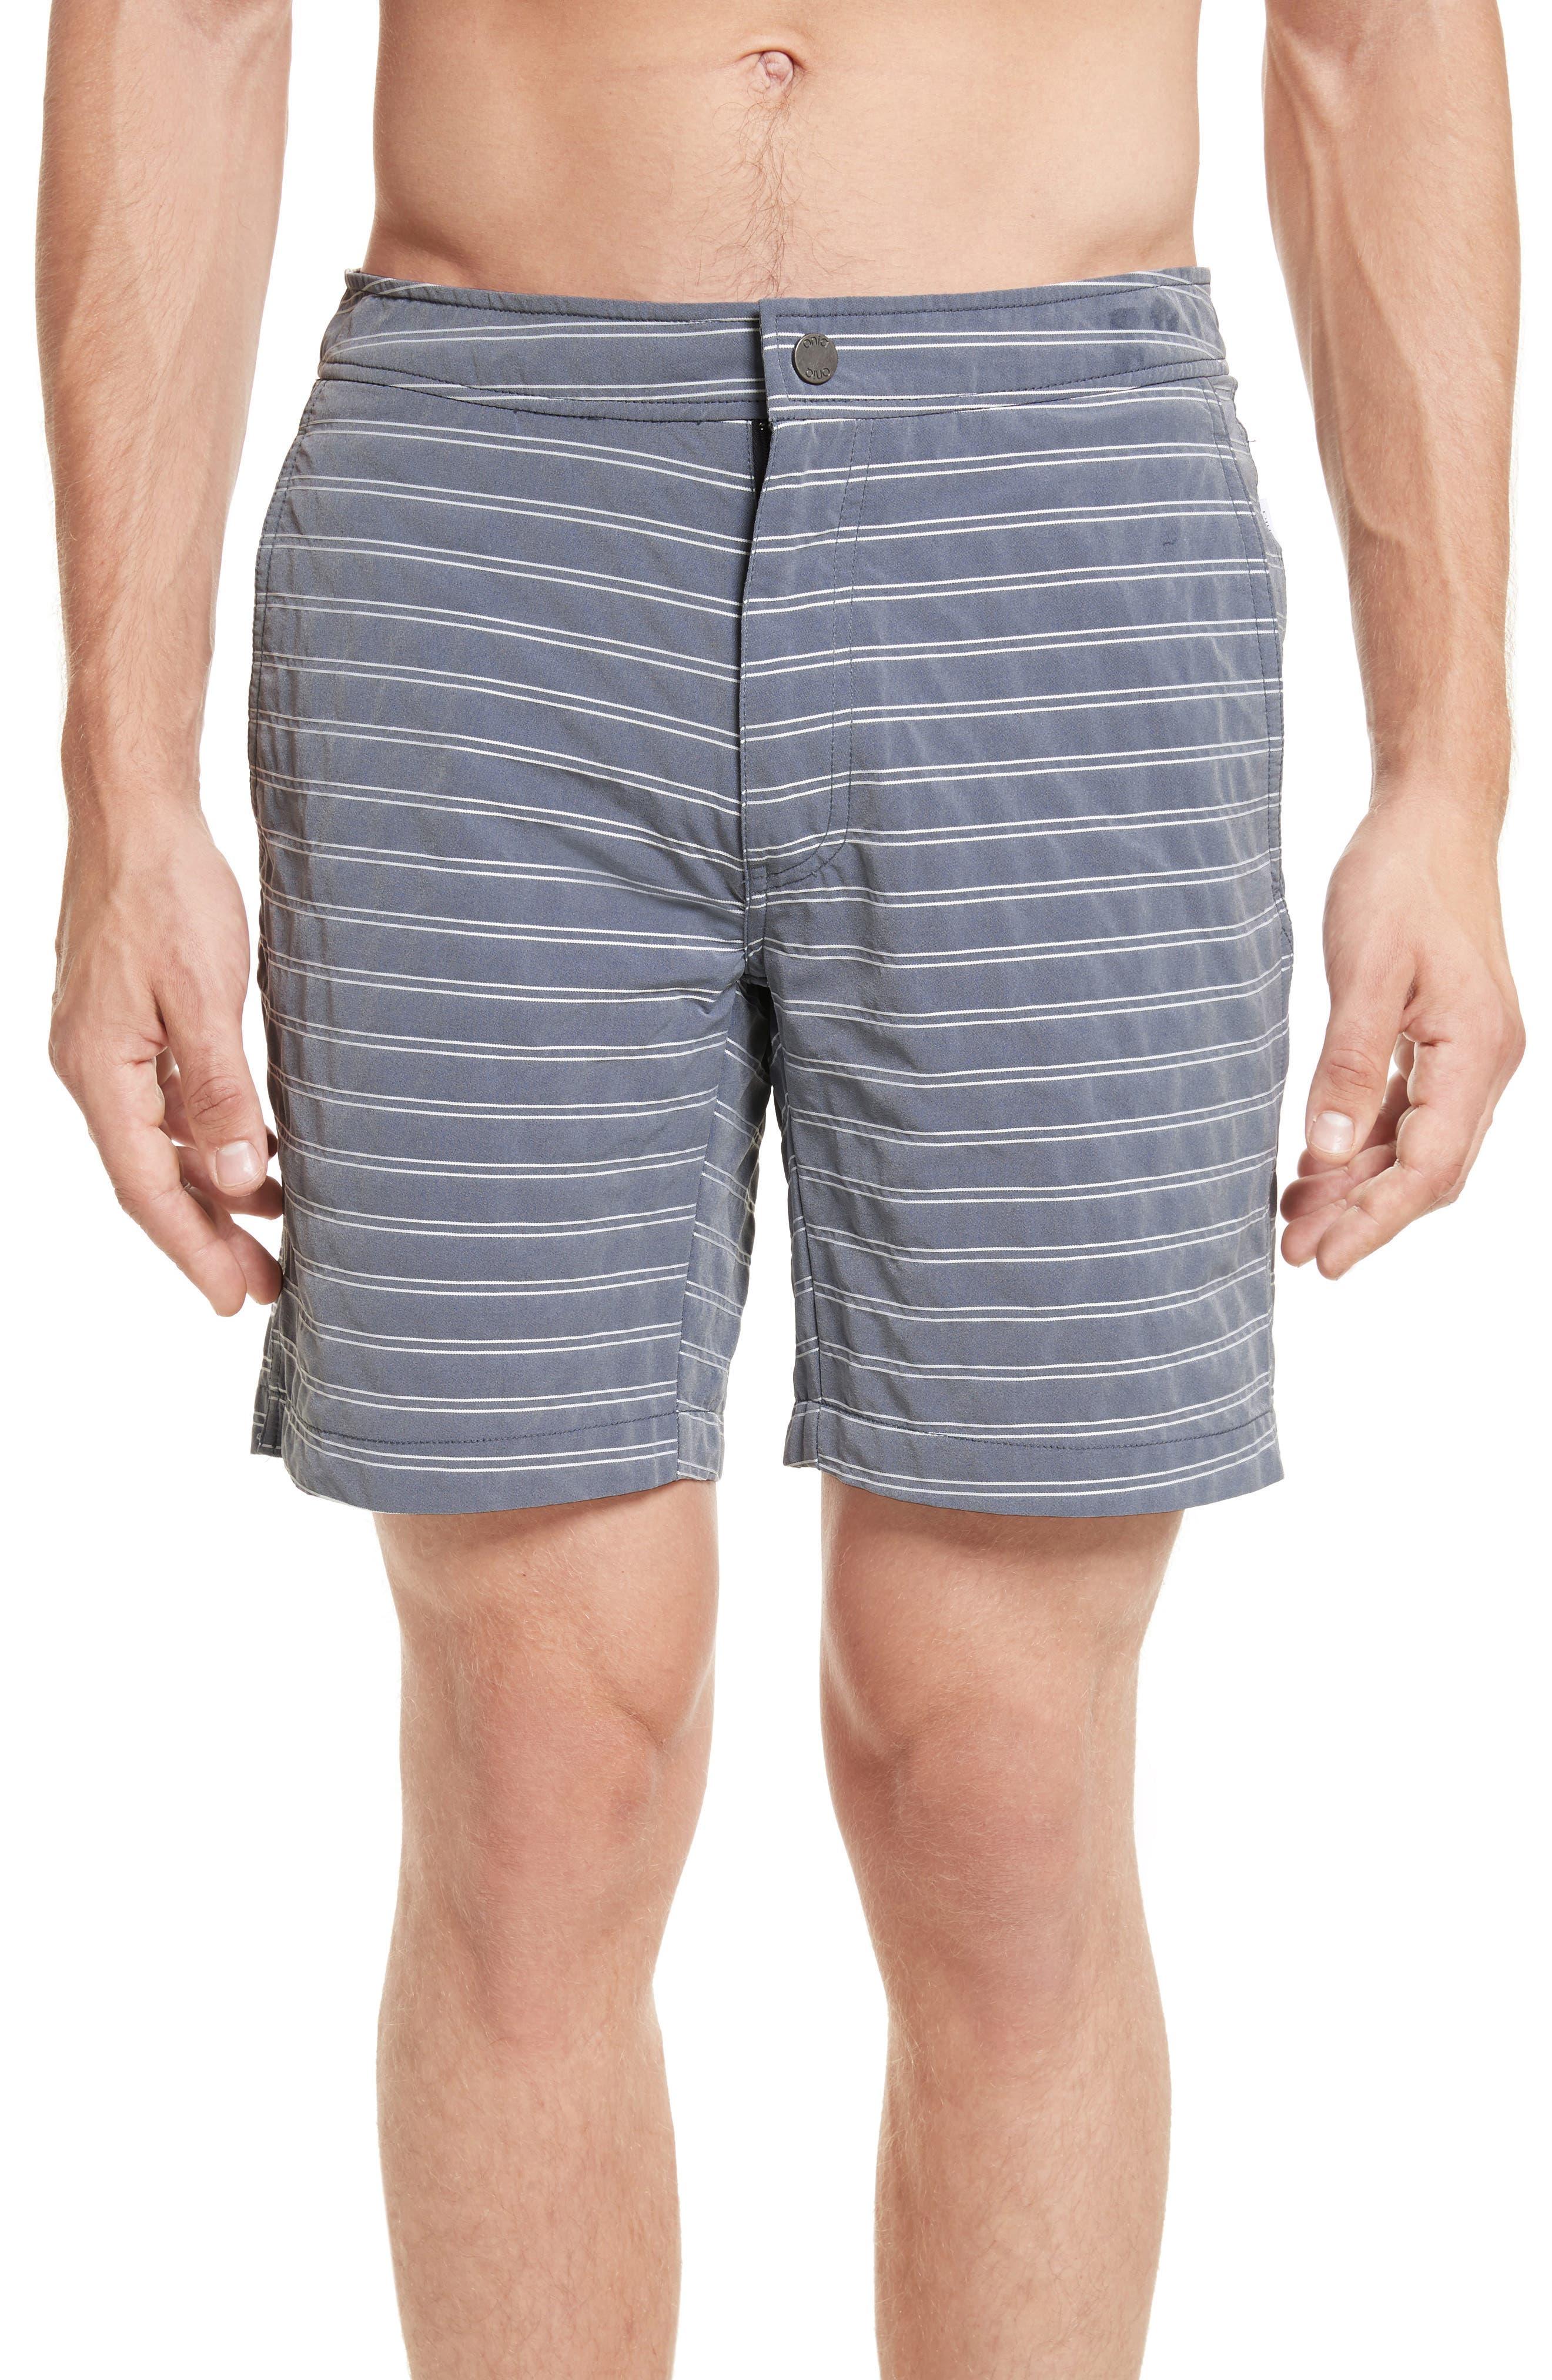 Alternate Image 1 Selected - ONIA Calder Stripe Board Shorts